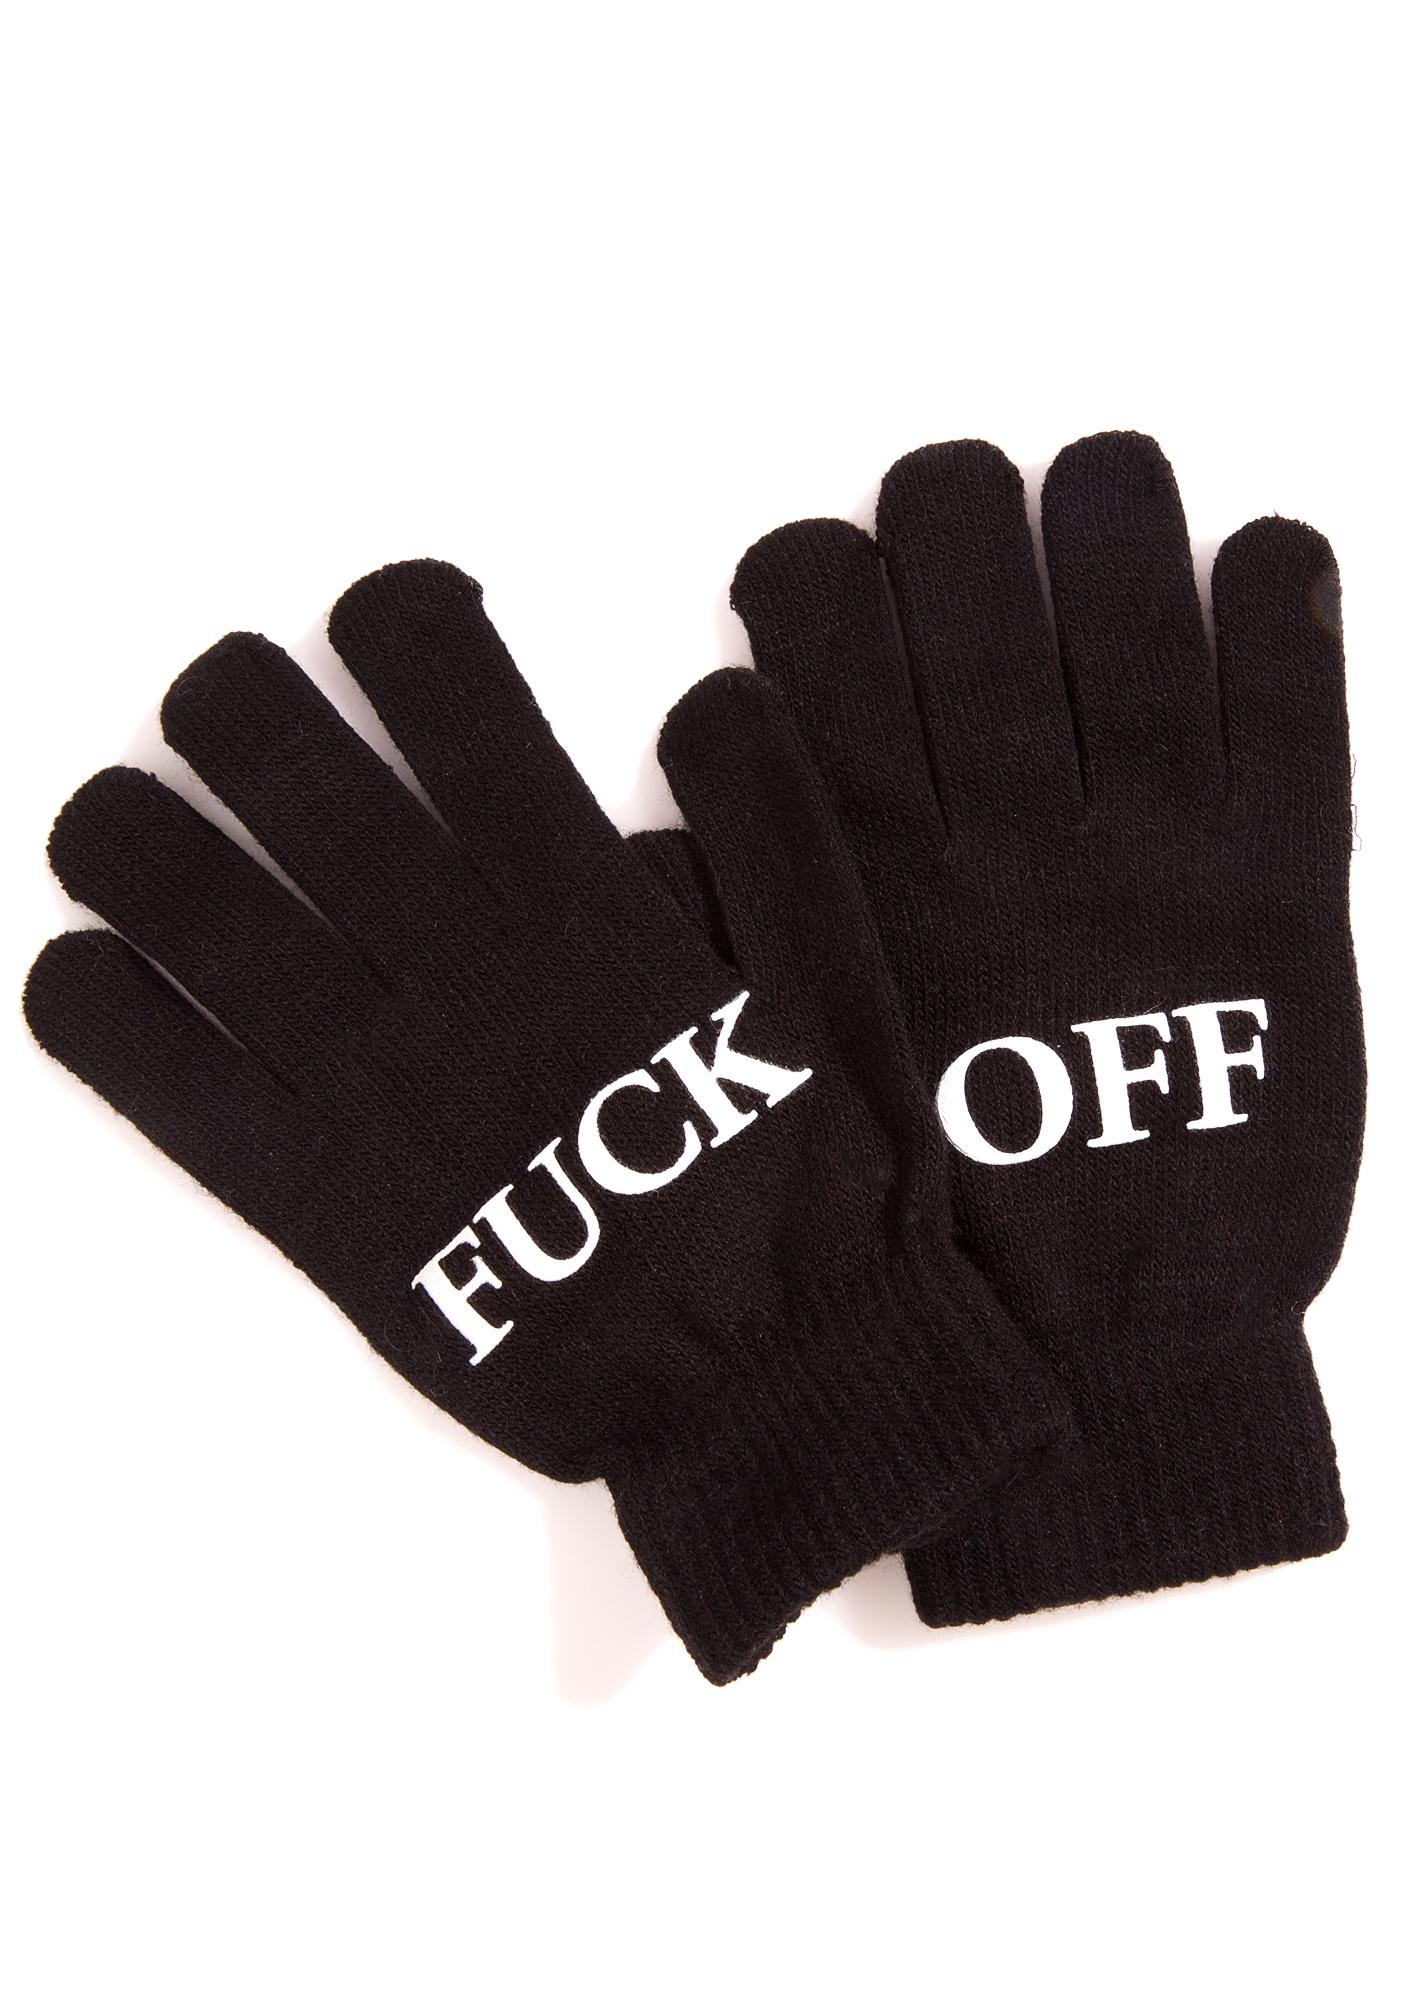 Cold Attitude Gloves